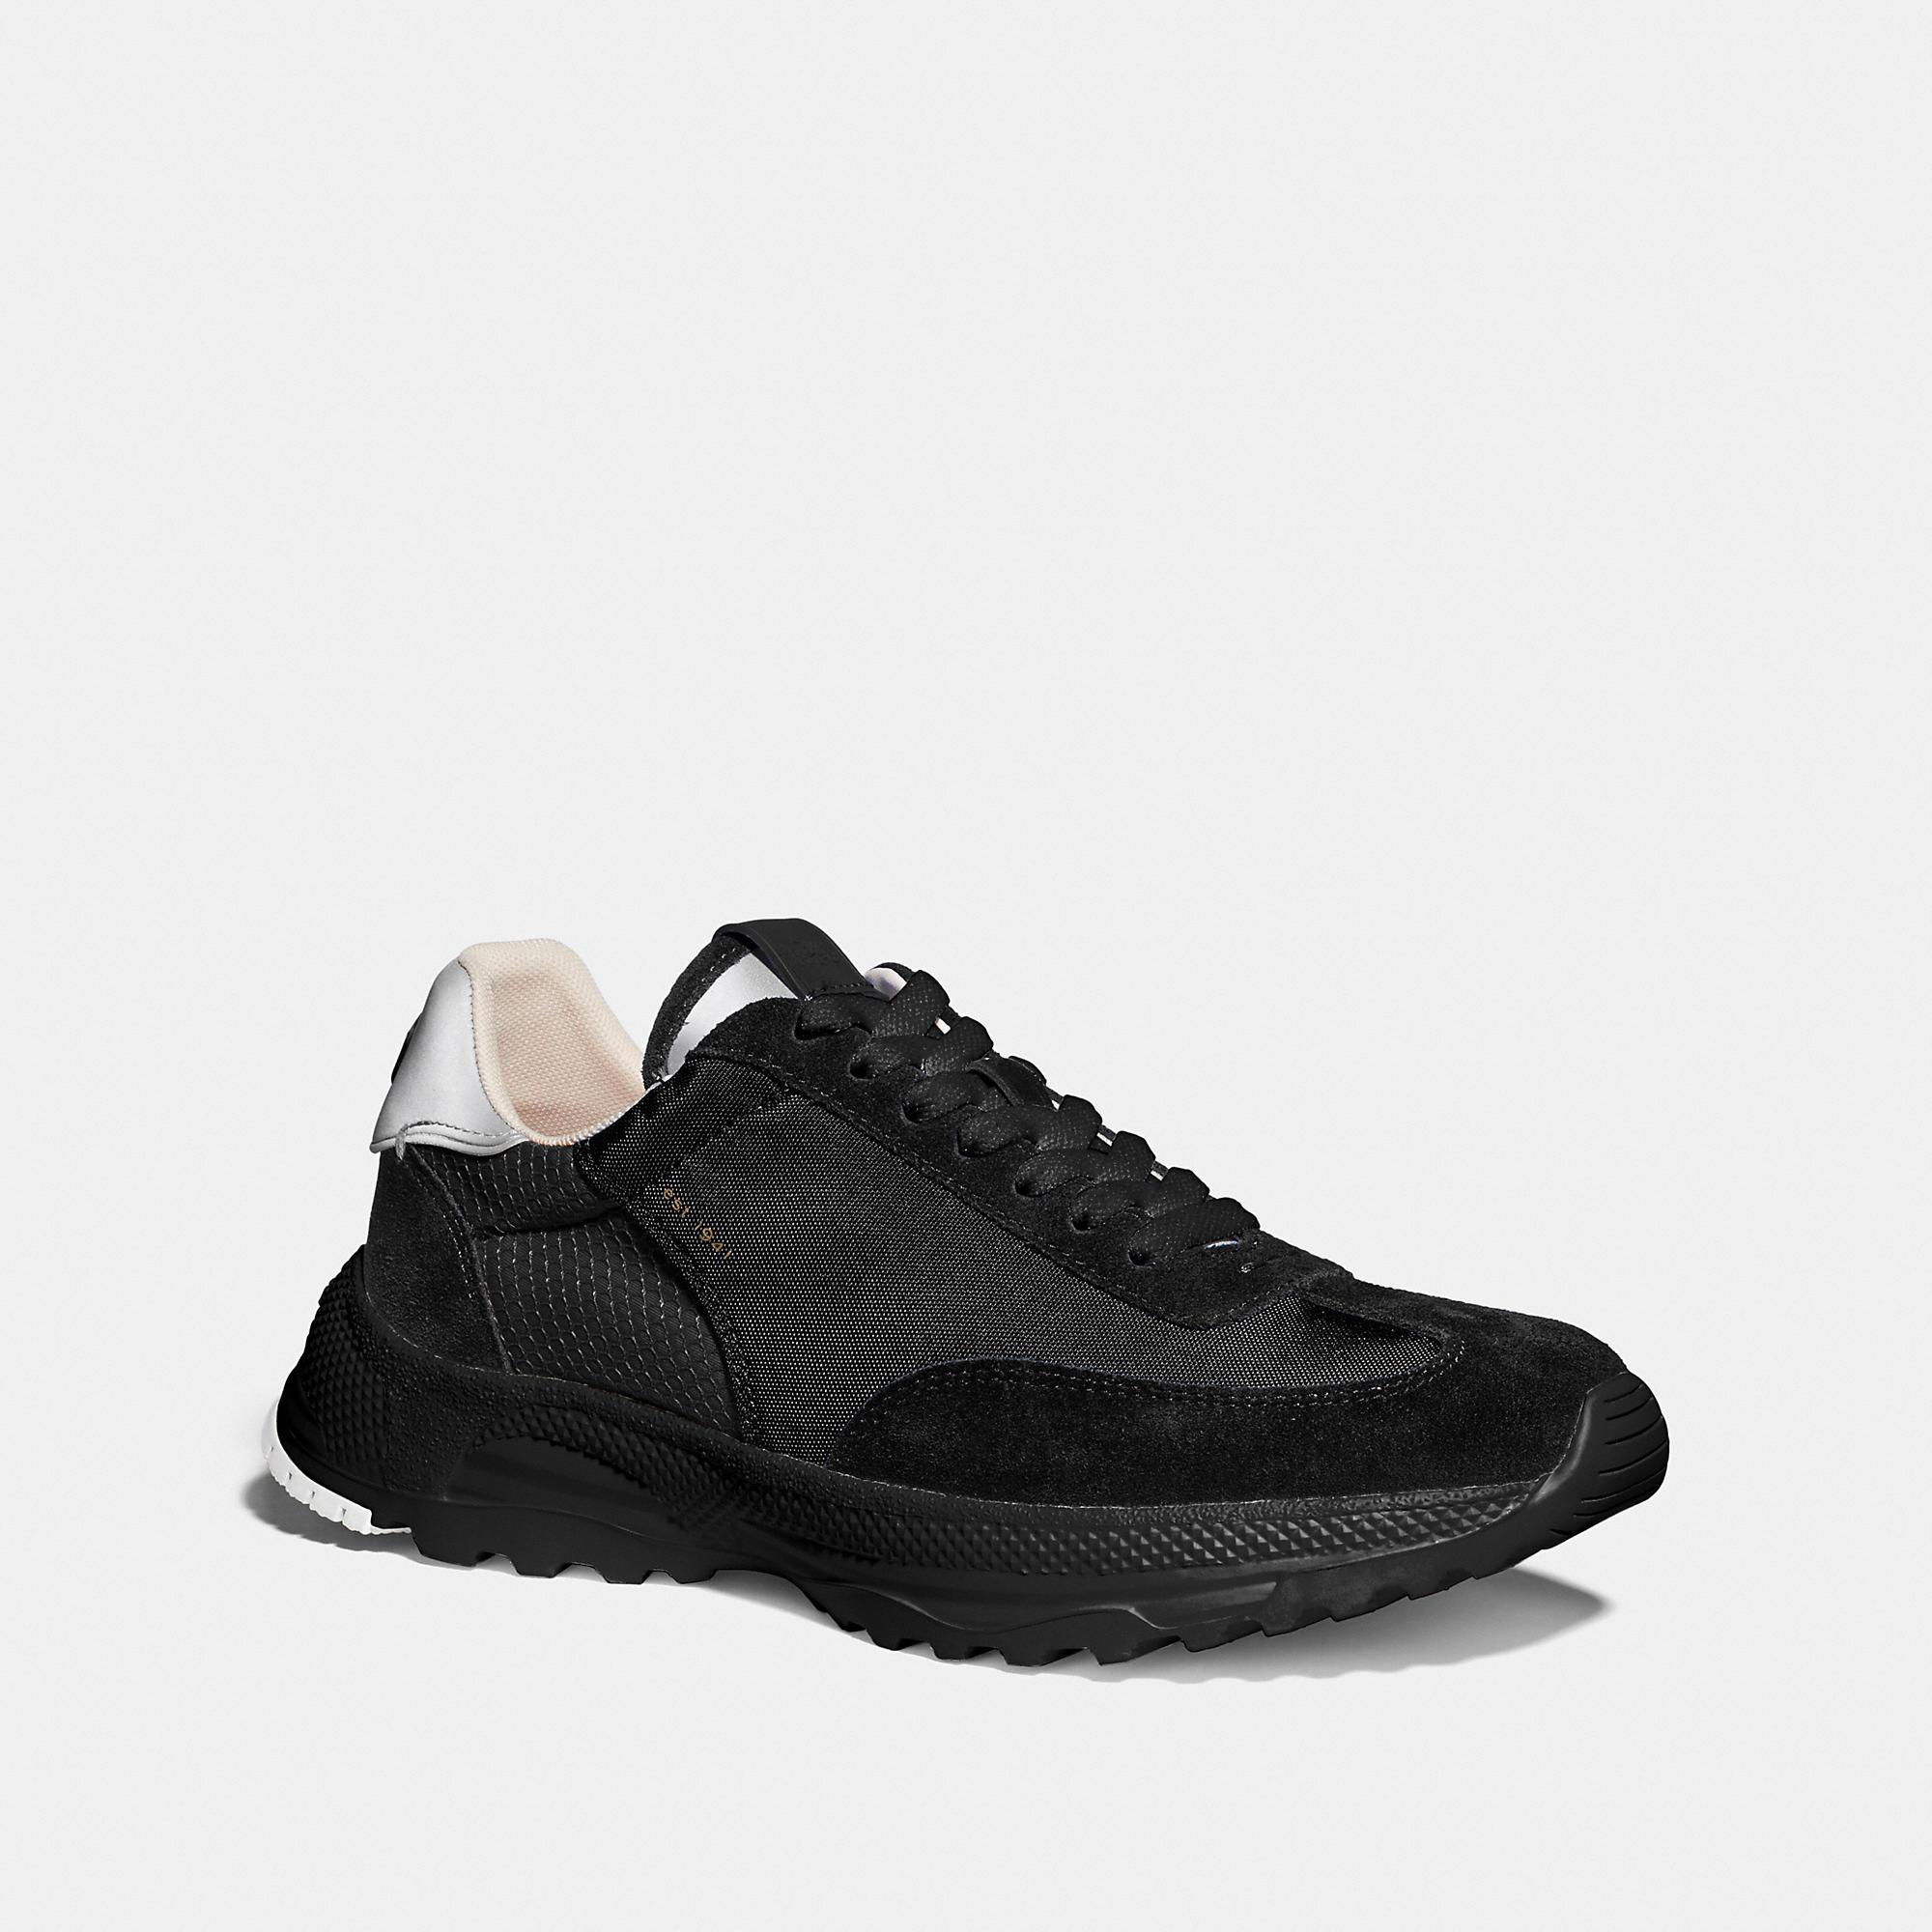 Coach Shoes COACH C155 PANELED RUNNER